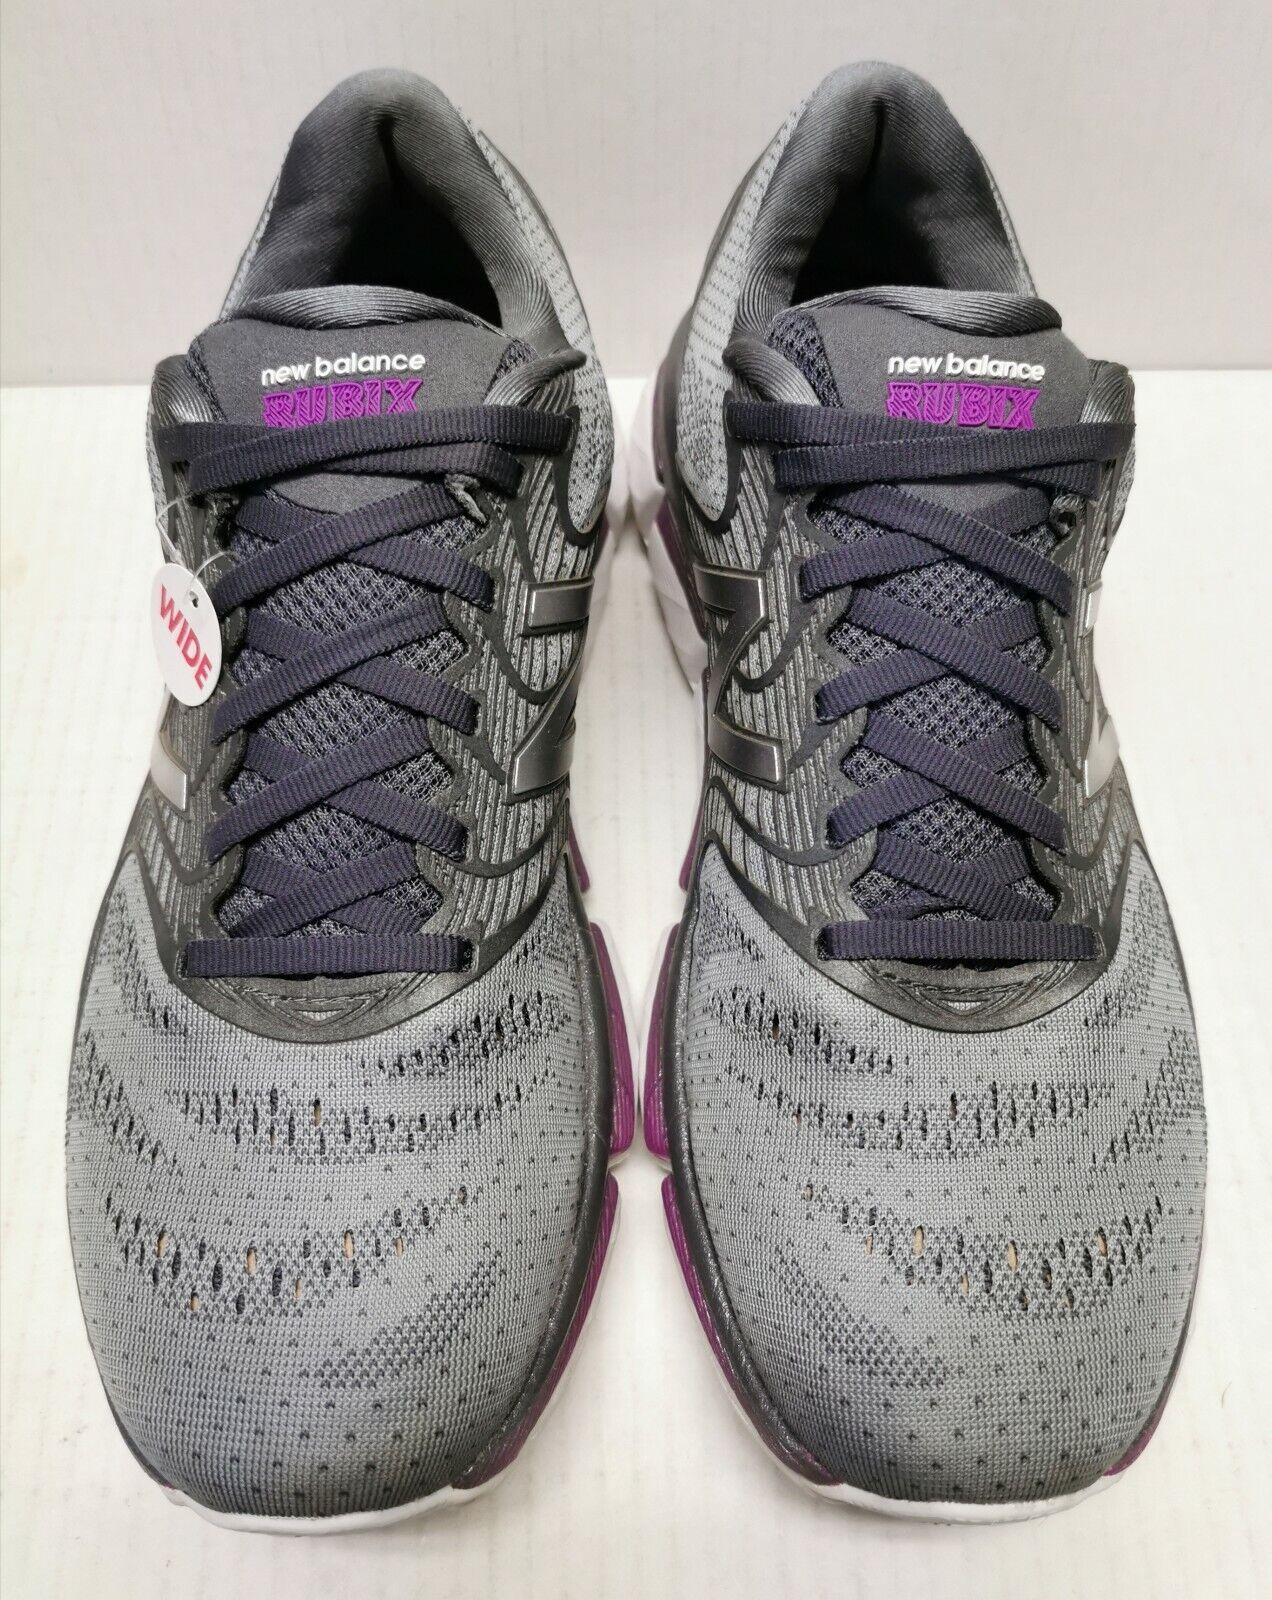 New Balance Rubix Women's Running Shoes Sneakers … - image 2